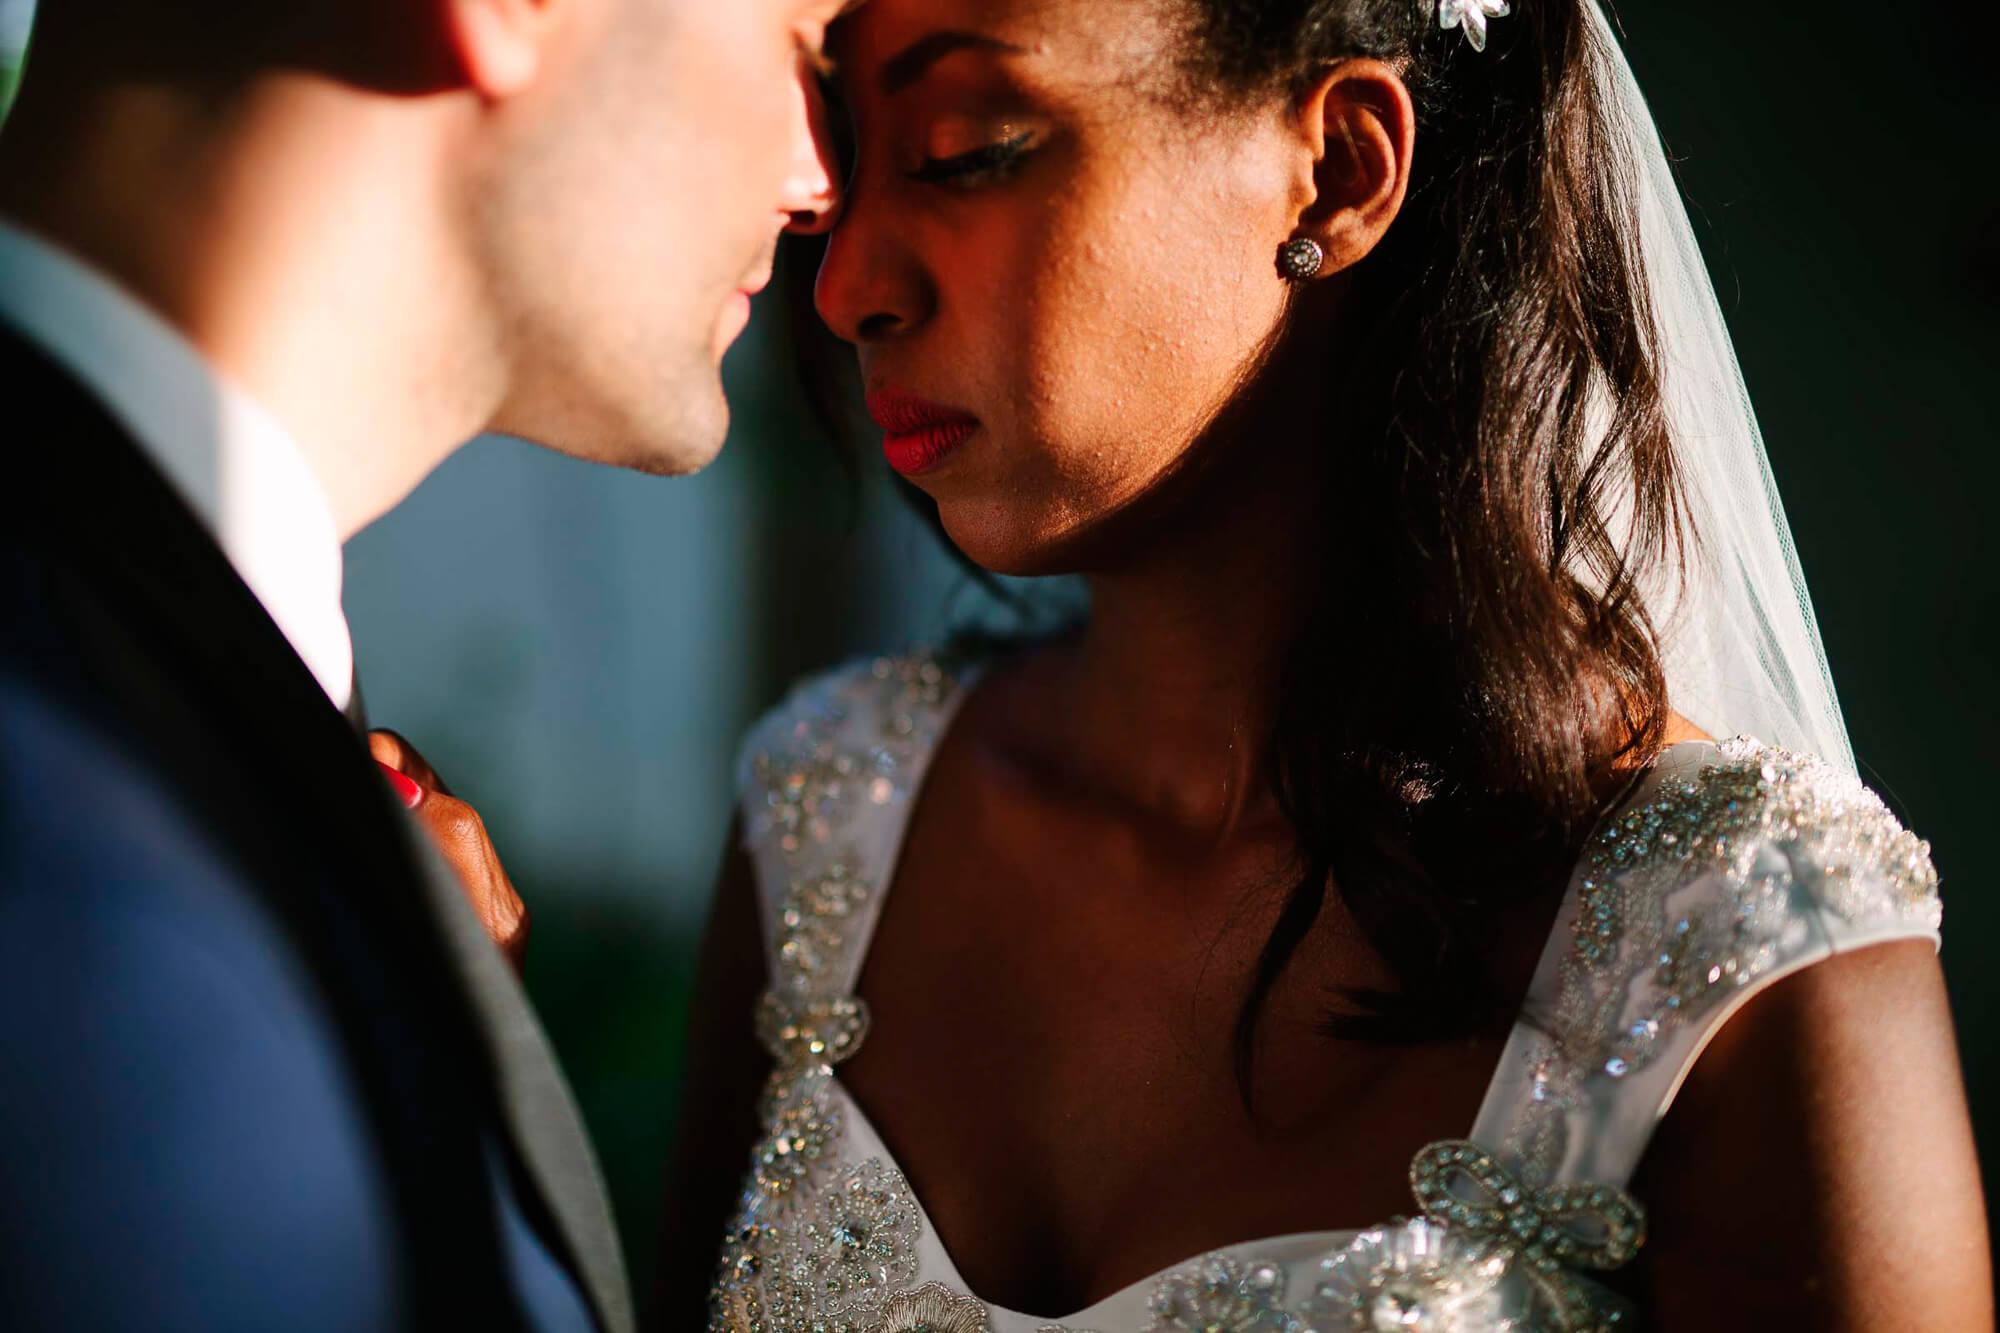 097-sorrento-wedding-photographer.jpg